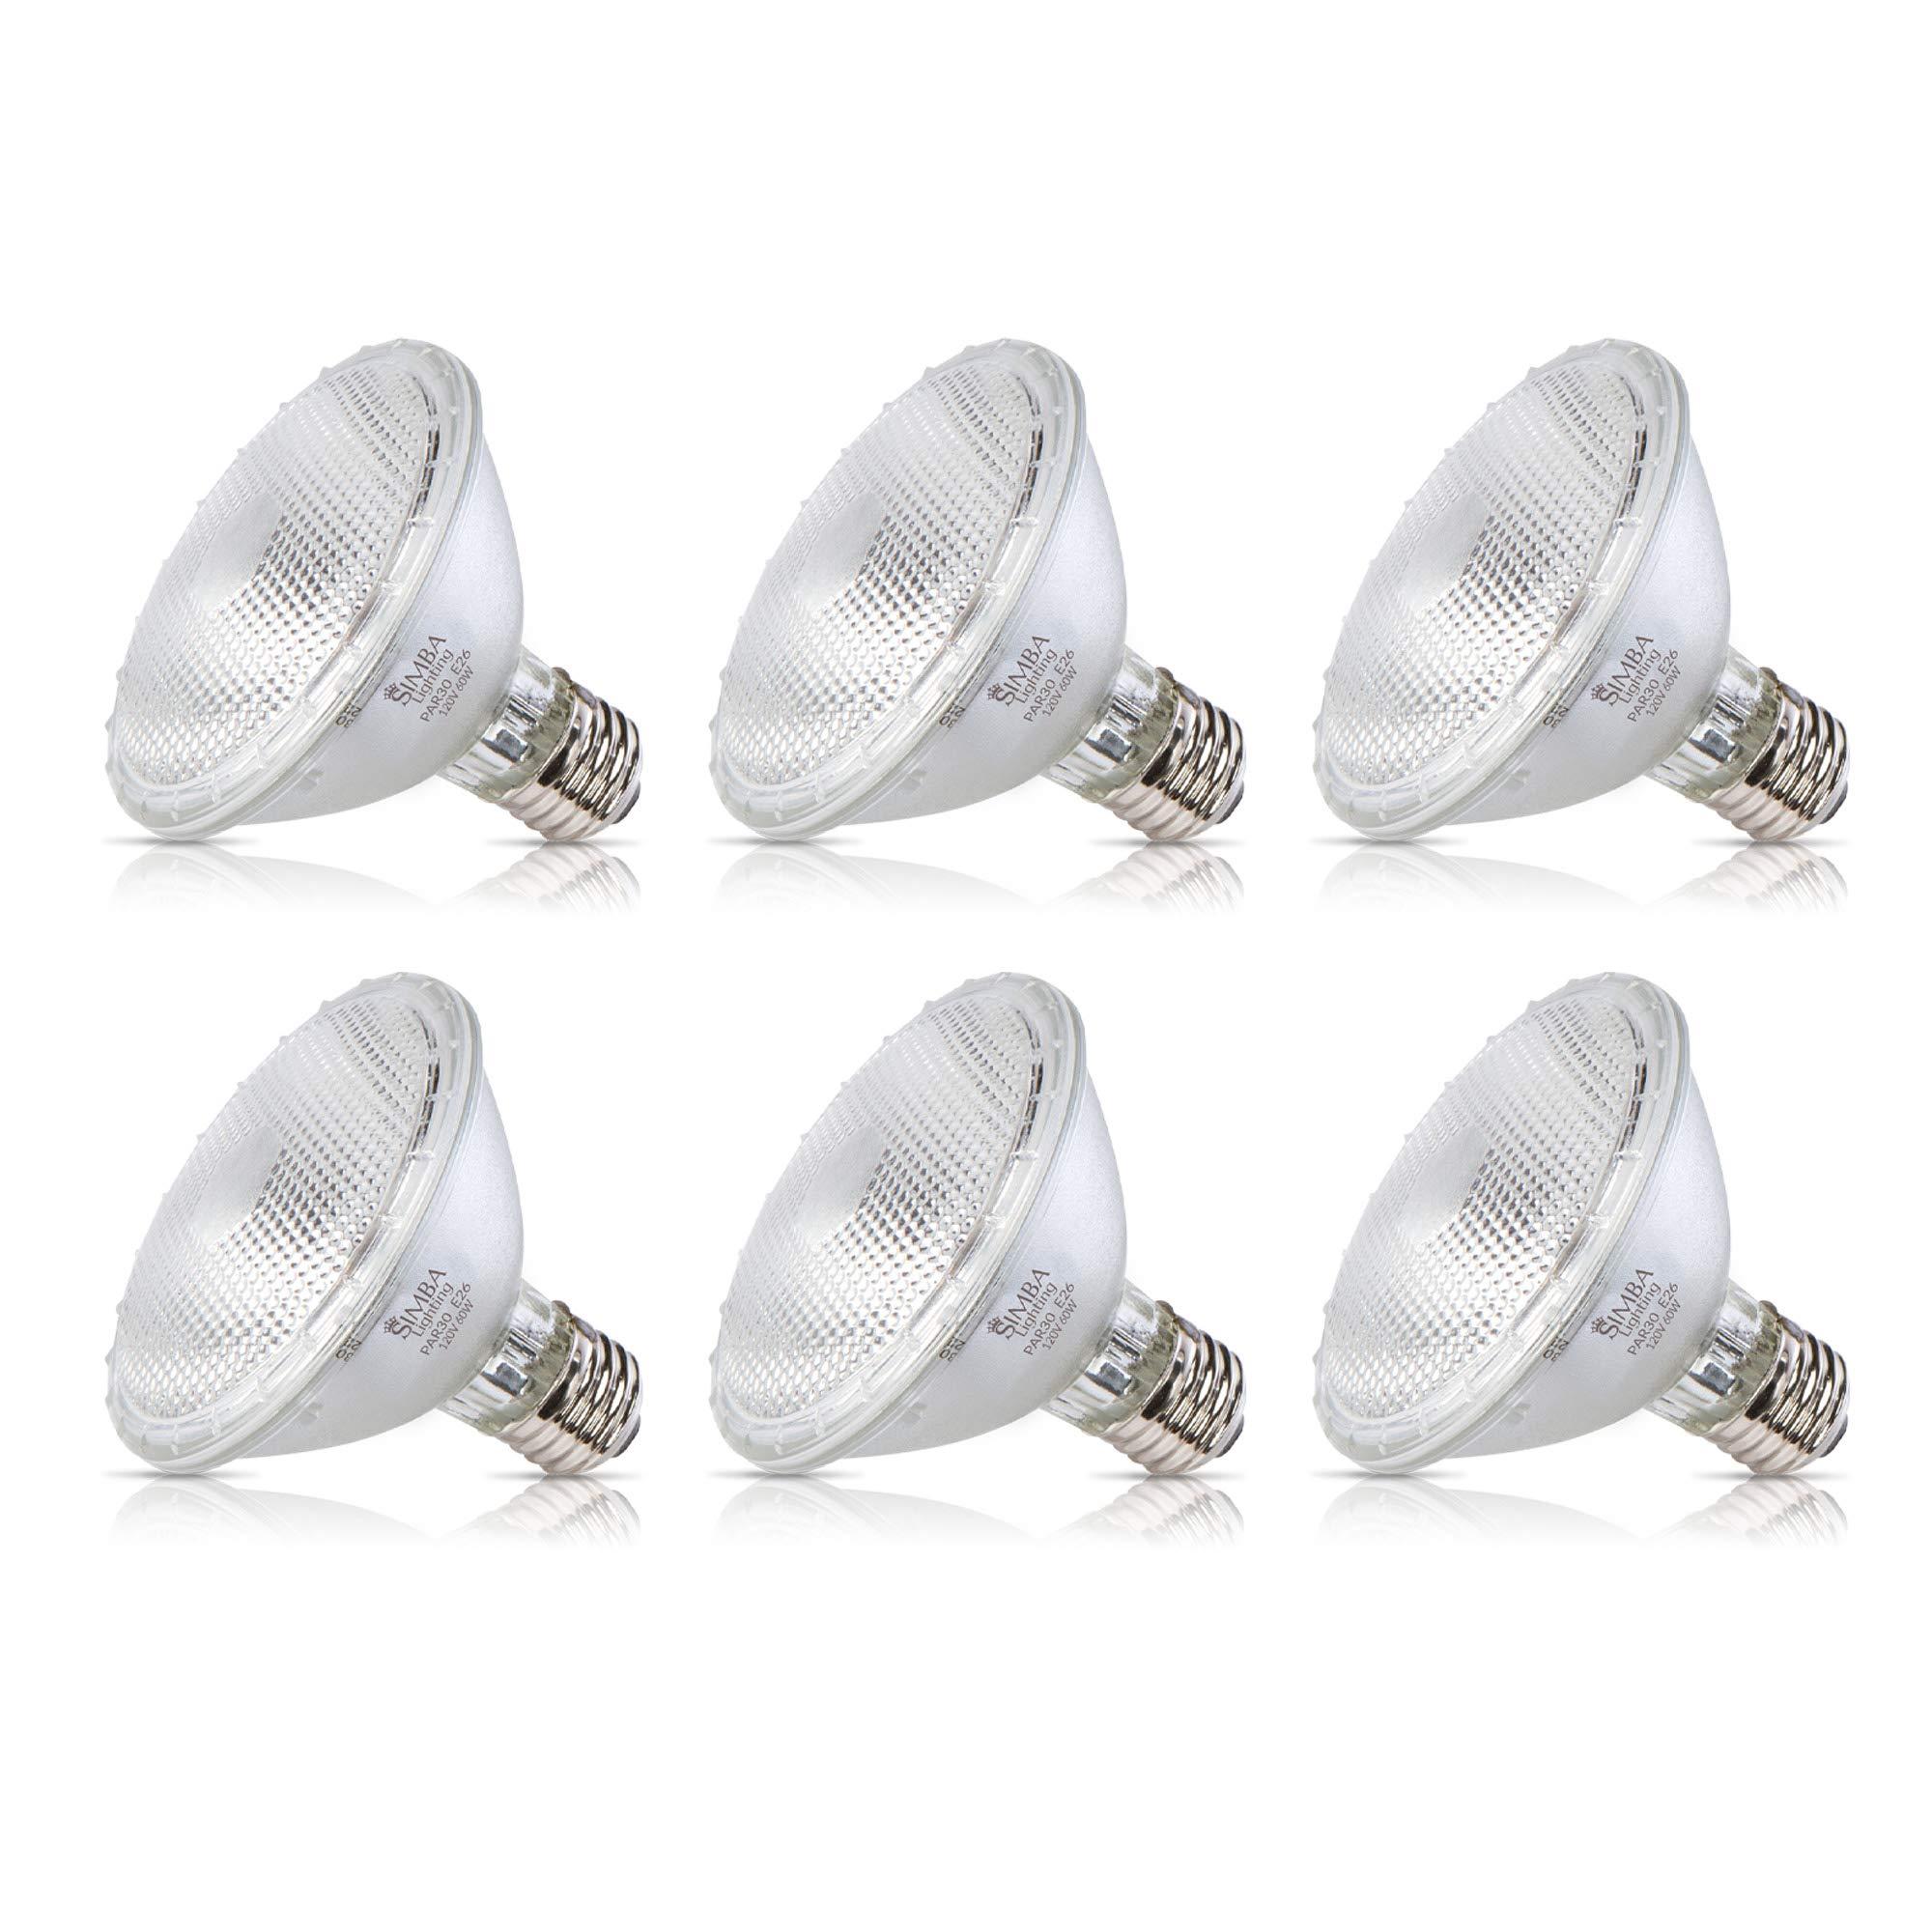 Simba Lighting Halogen PAR30 Short Neck Light Bulb 60W 60PAR30/FL 30deg Spotlight Dimmable (6-Pack) for Indoor Recessed Can and Outdoor PAR 30, 120V E26 Base, 75W Replacement, 2700K Warm White